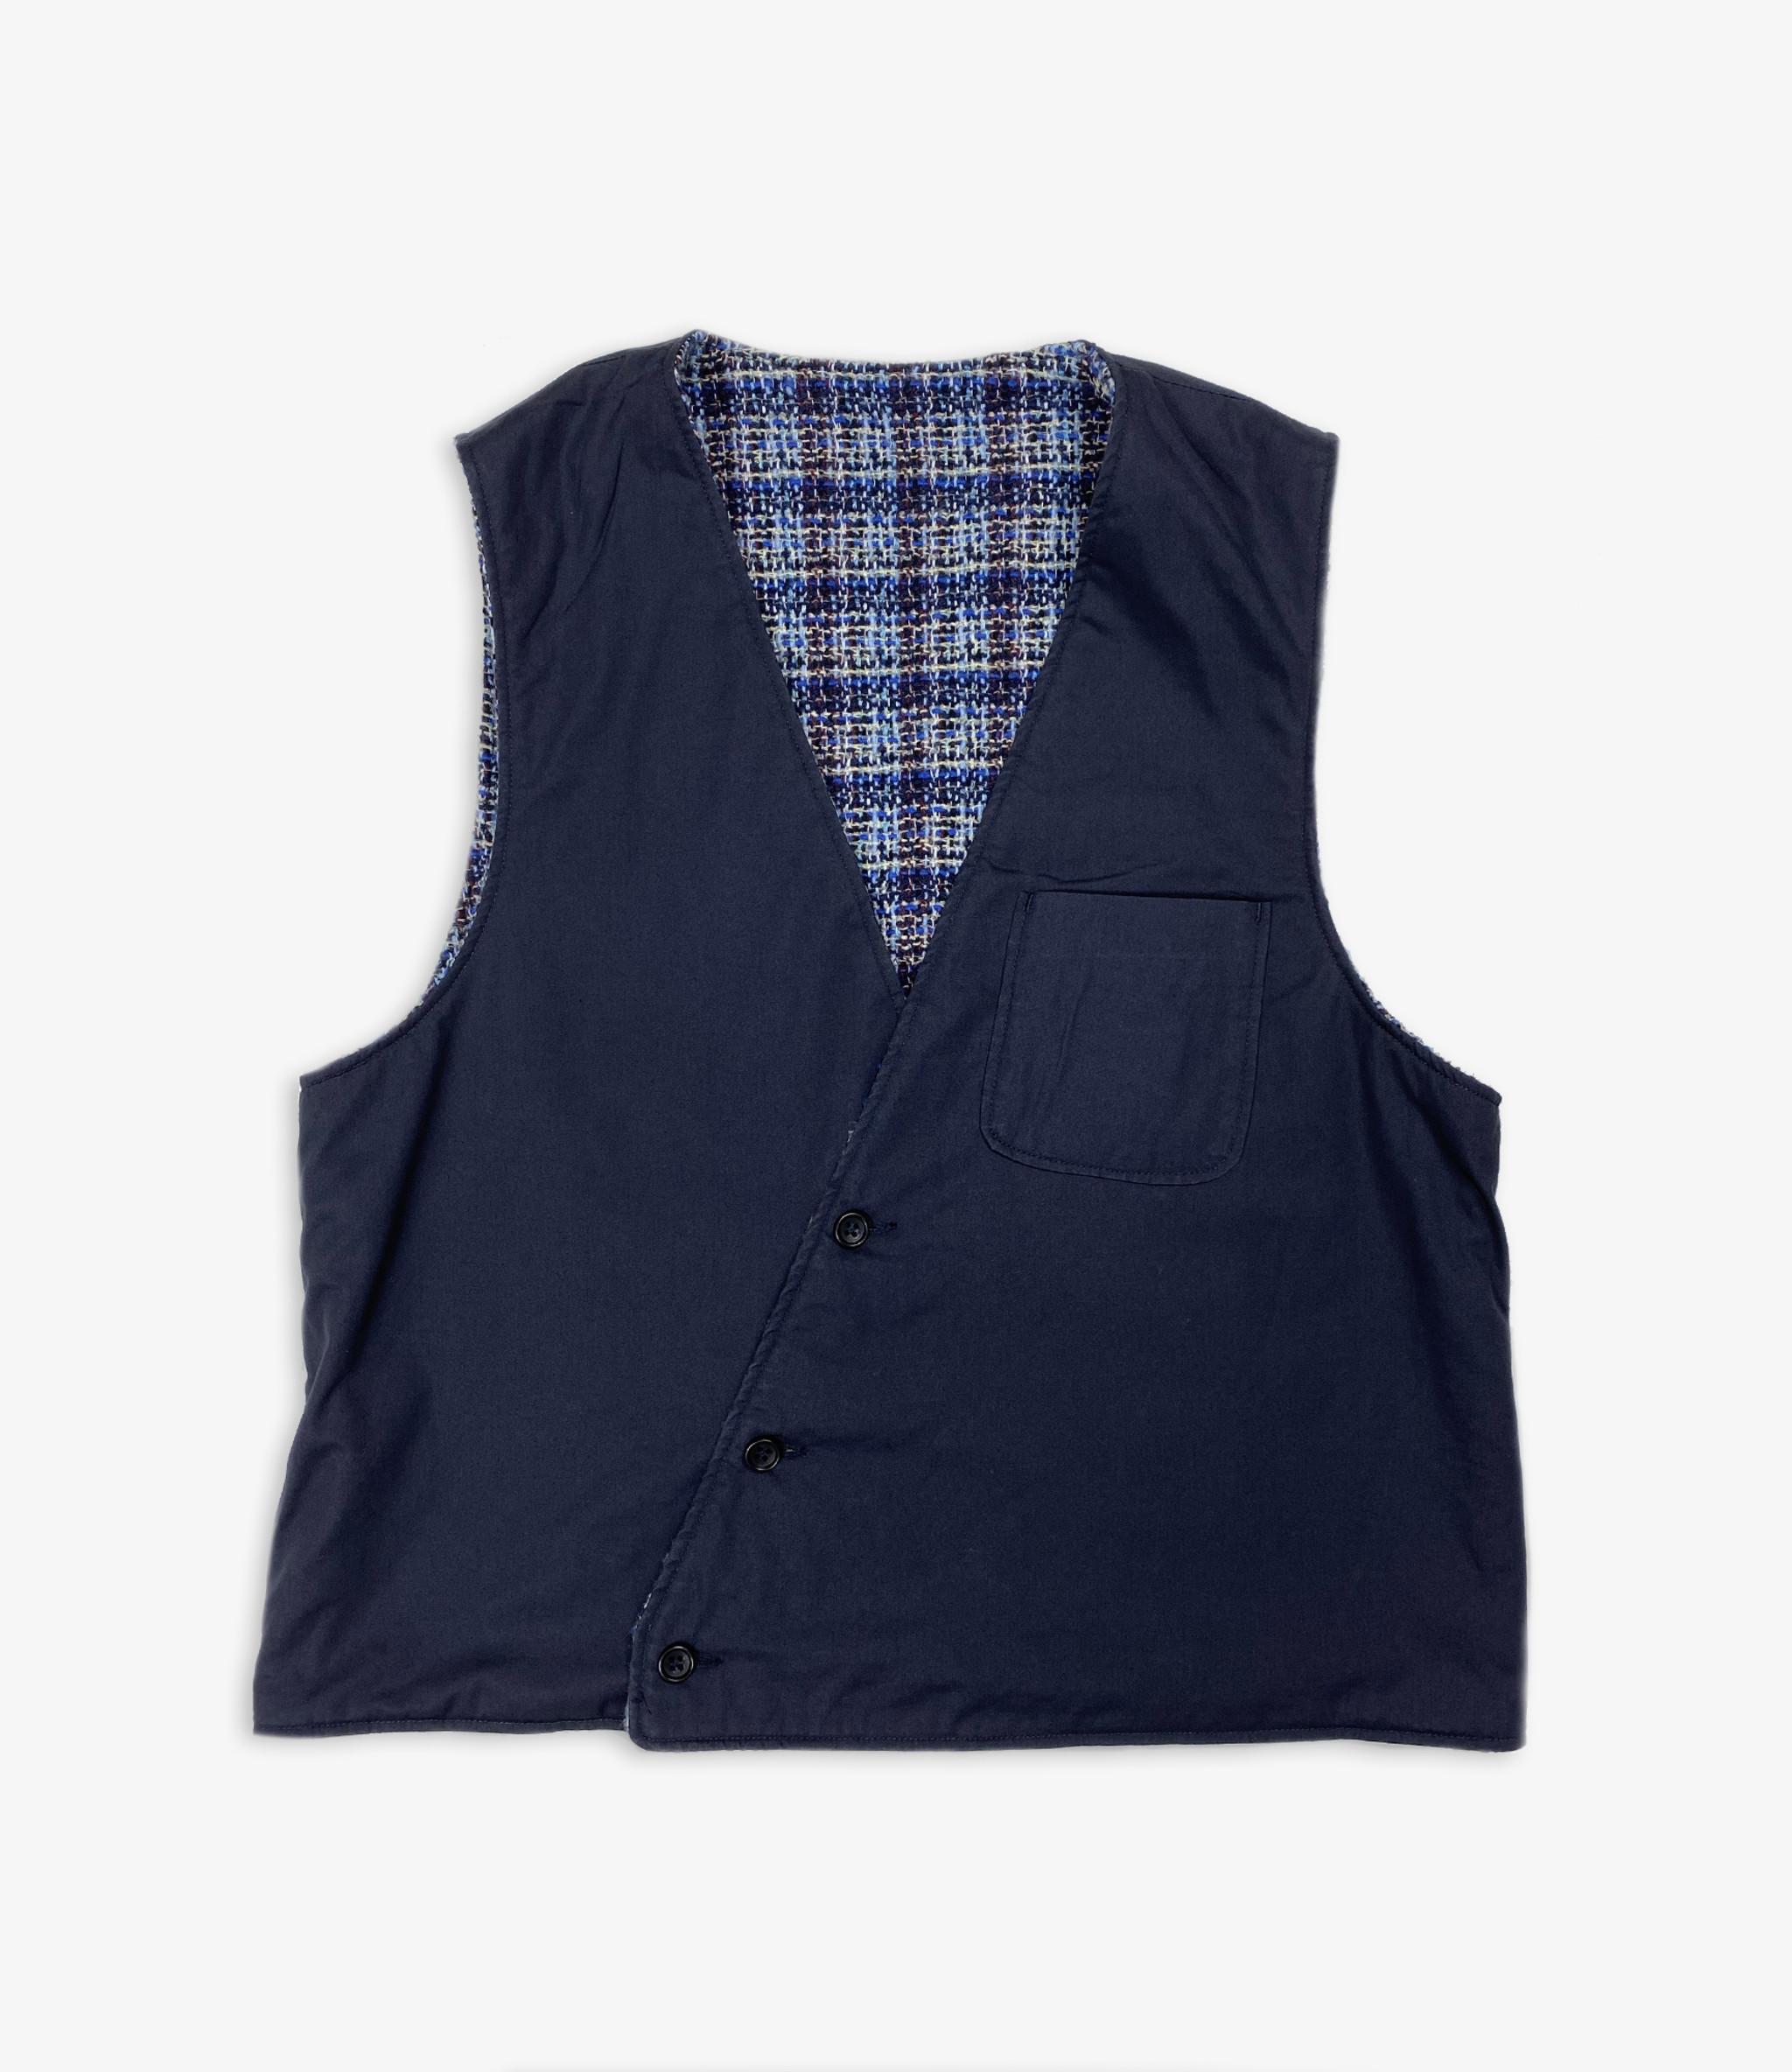 Engineered Garments Reversible Vest - Dk.Navy High Count Twill